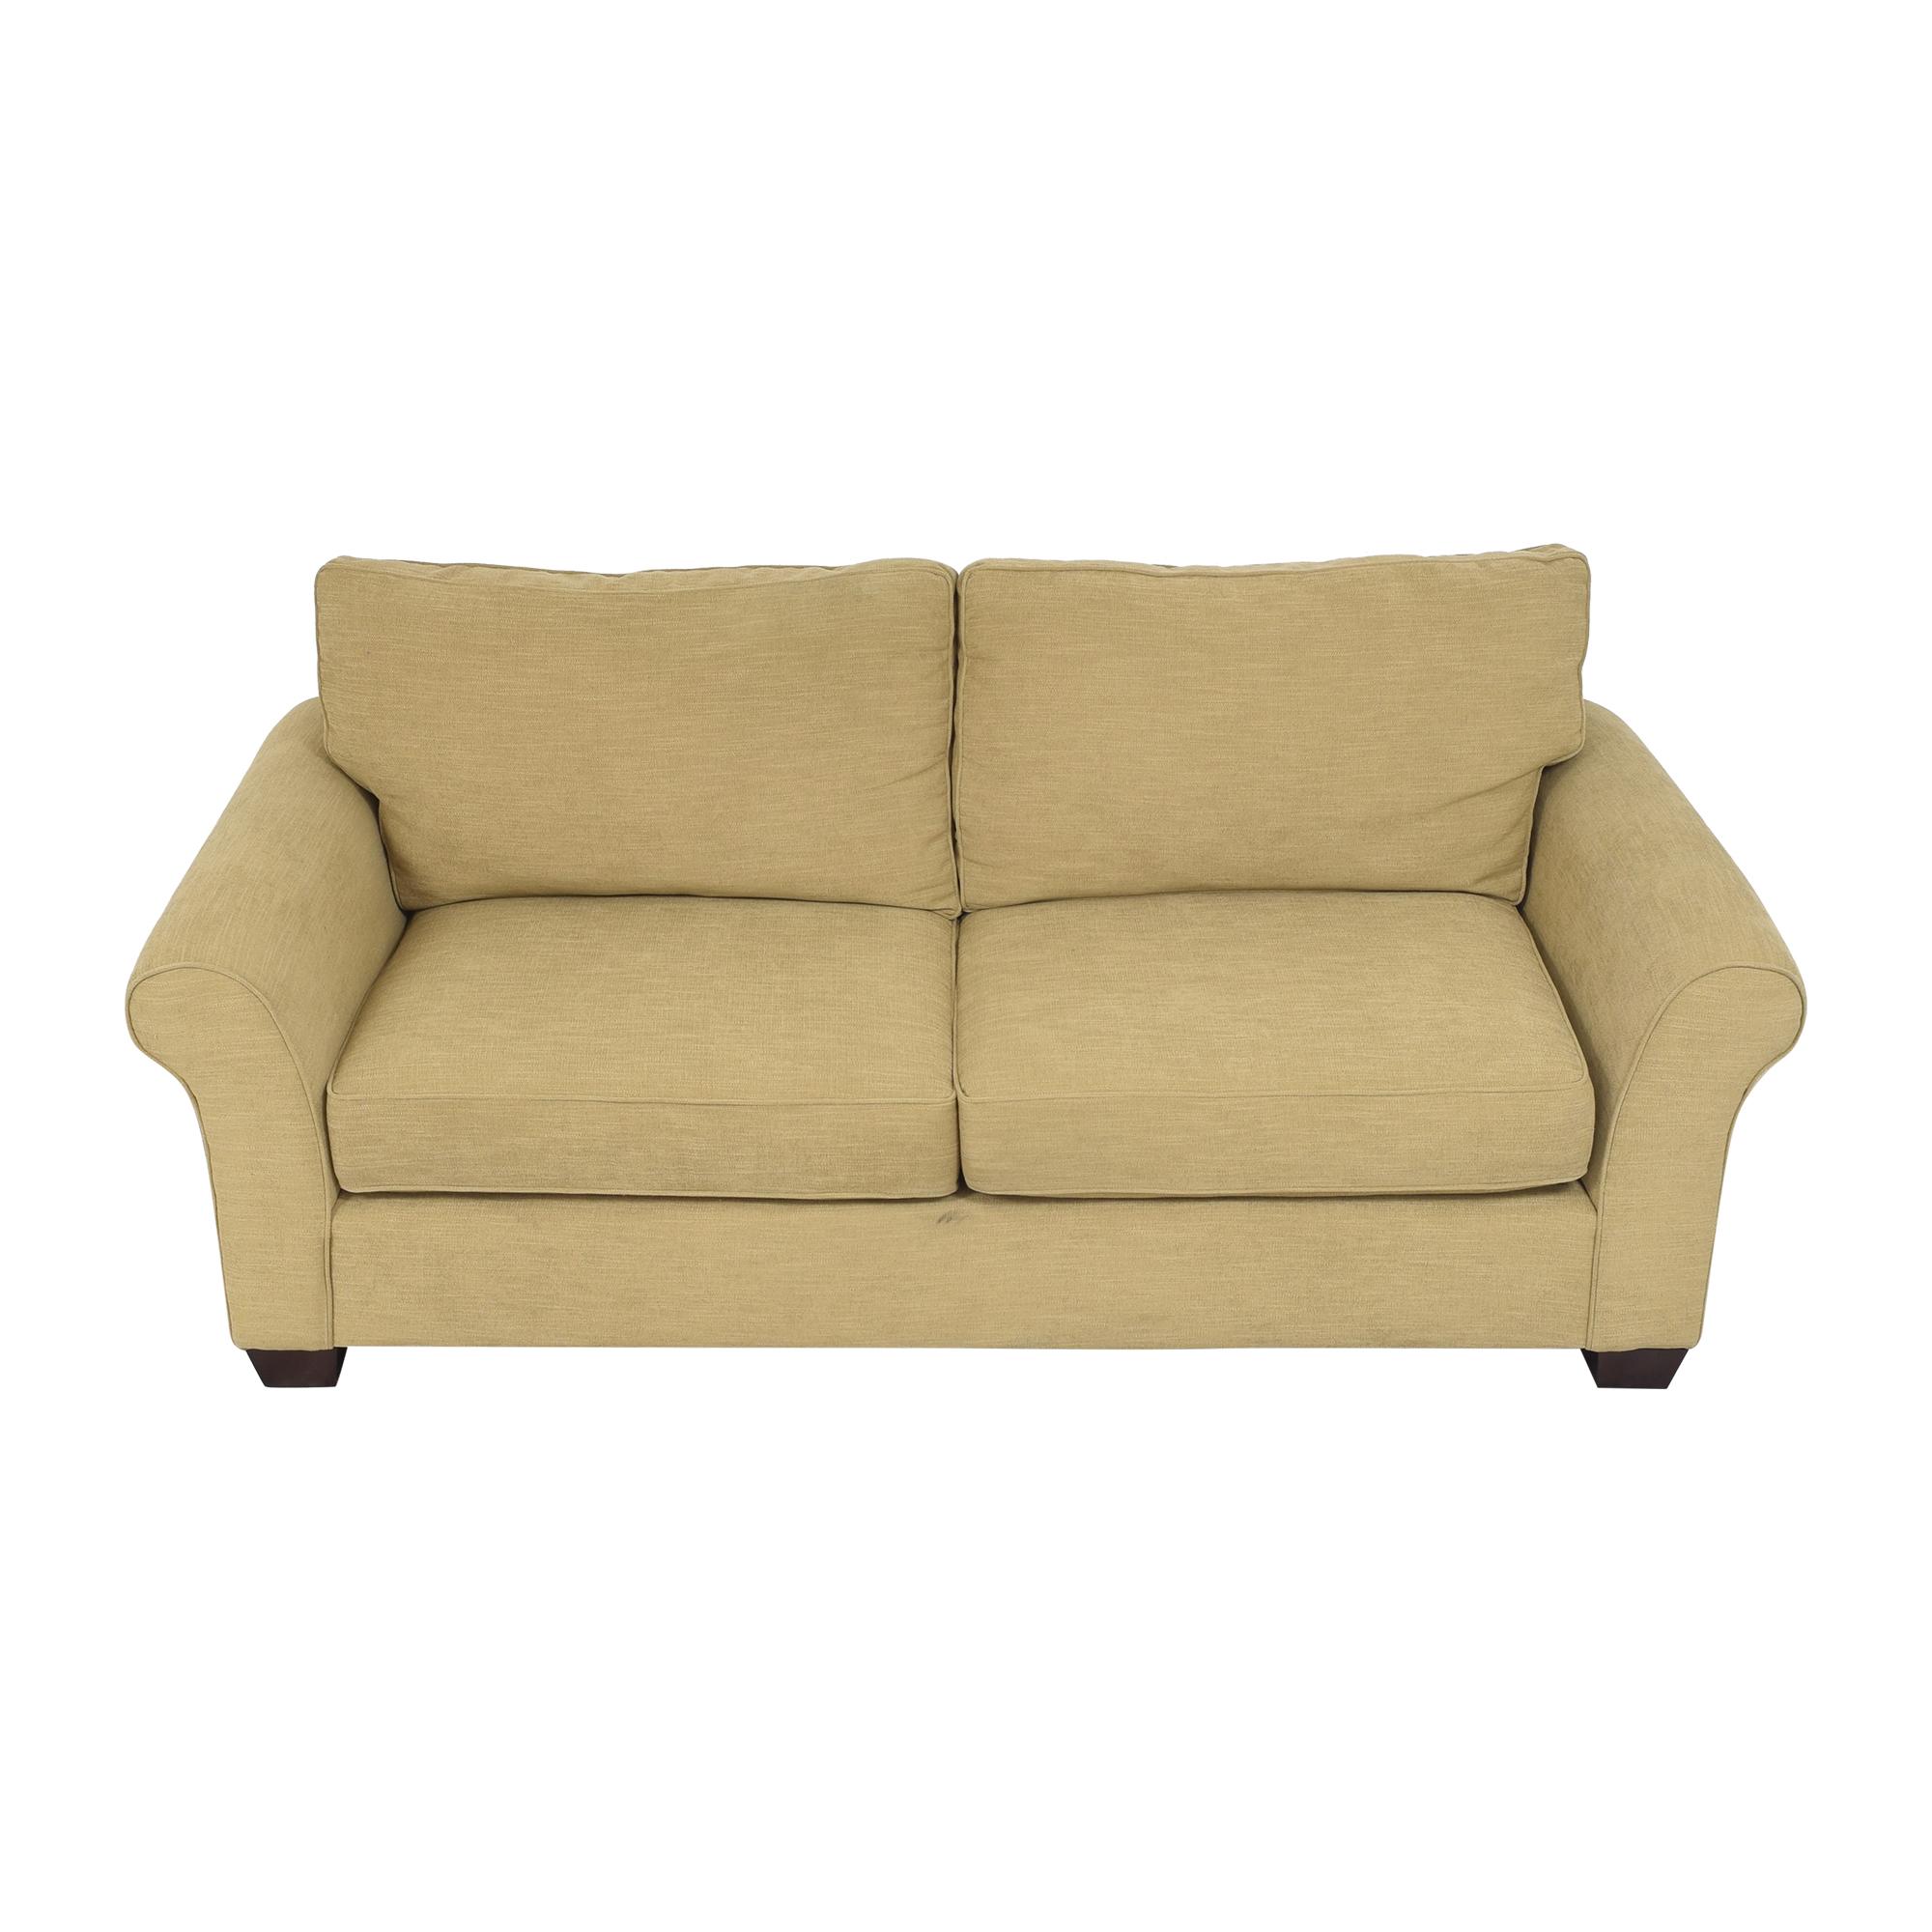 Pottery Barn Pottery Barn Comfort Roll Arm Sofa nj